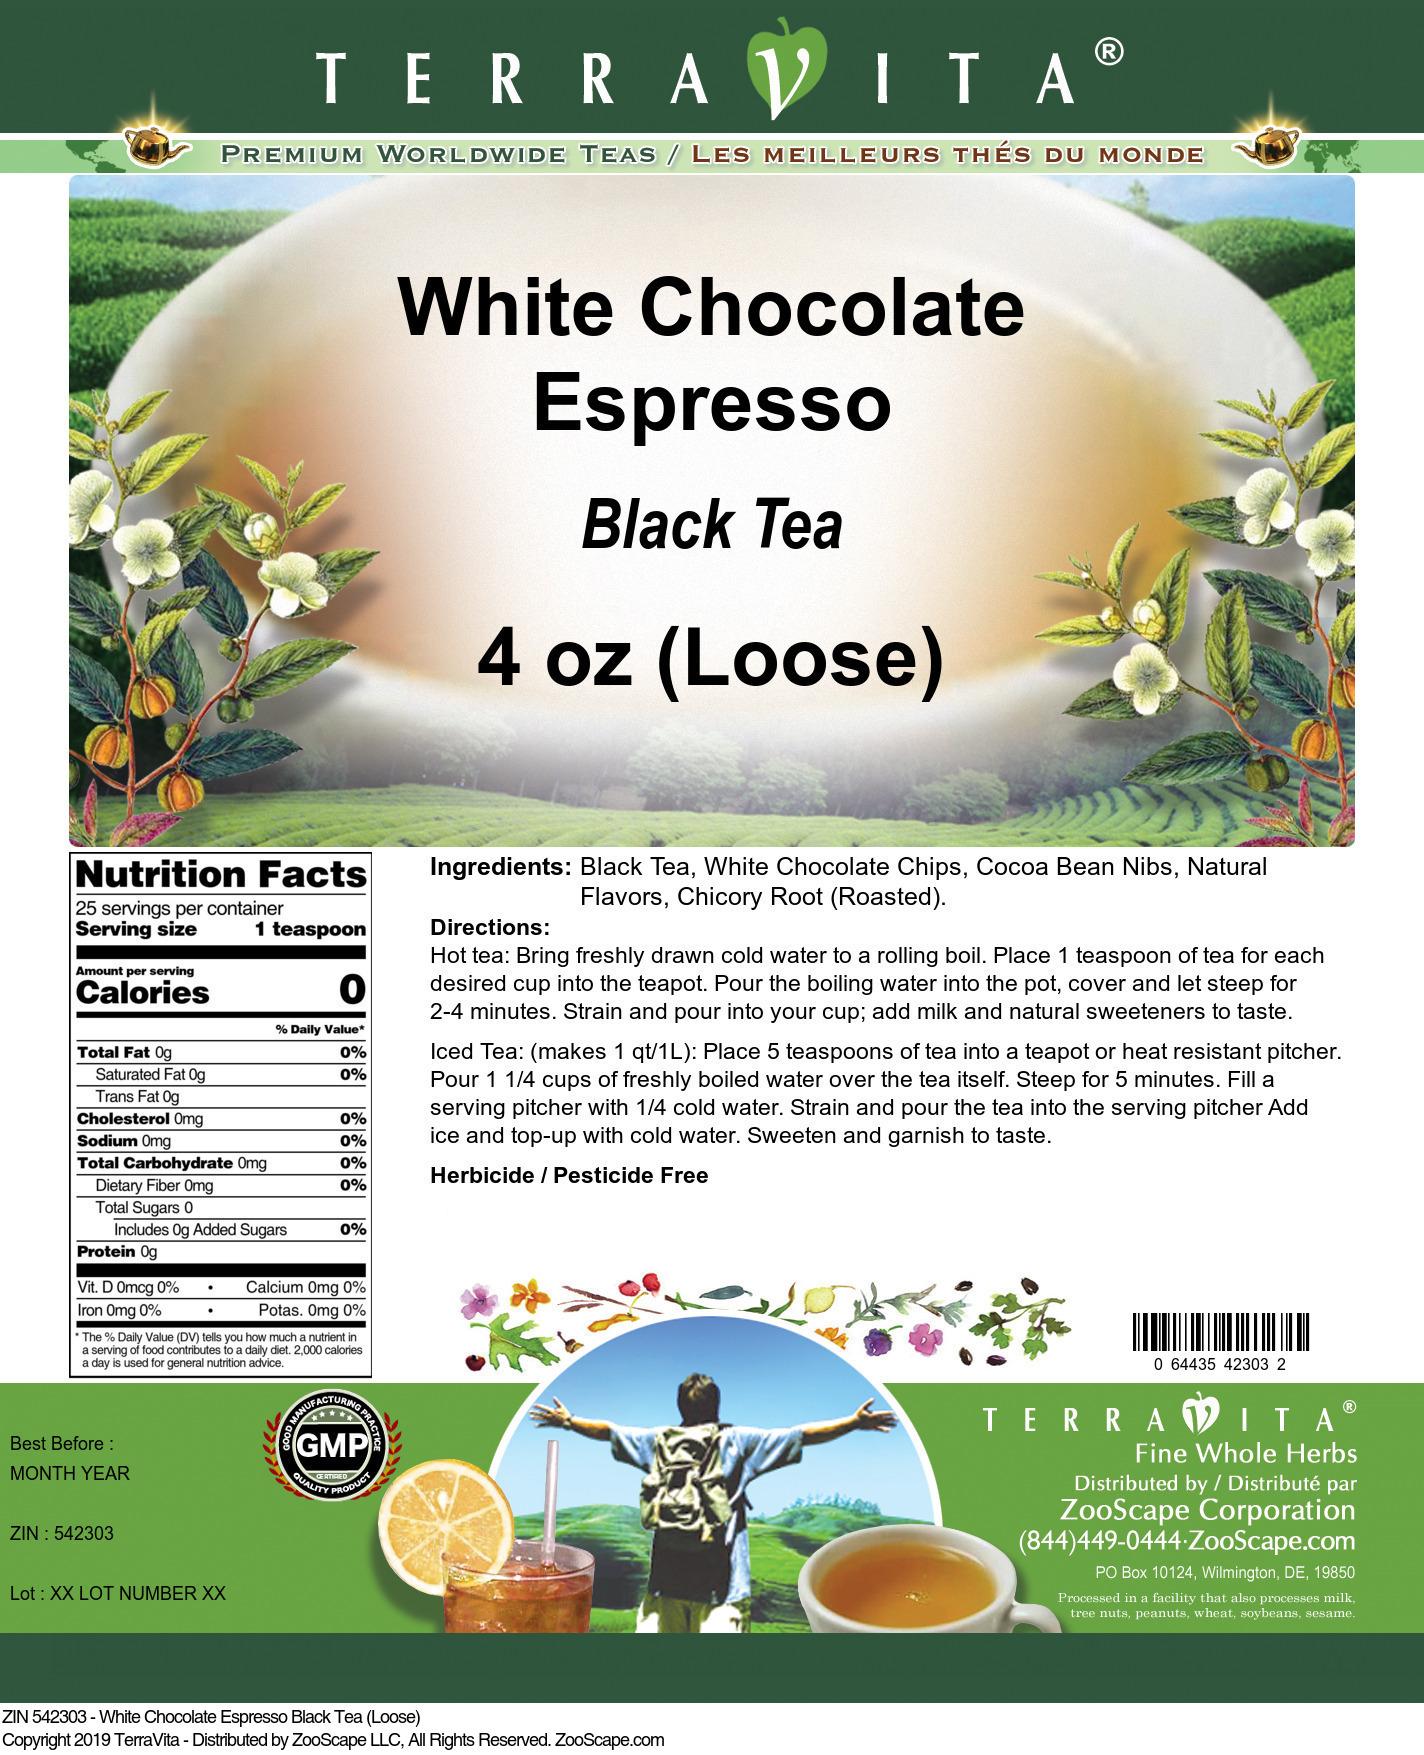 White Chocolate Espresso Black Tea (Loose)